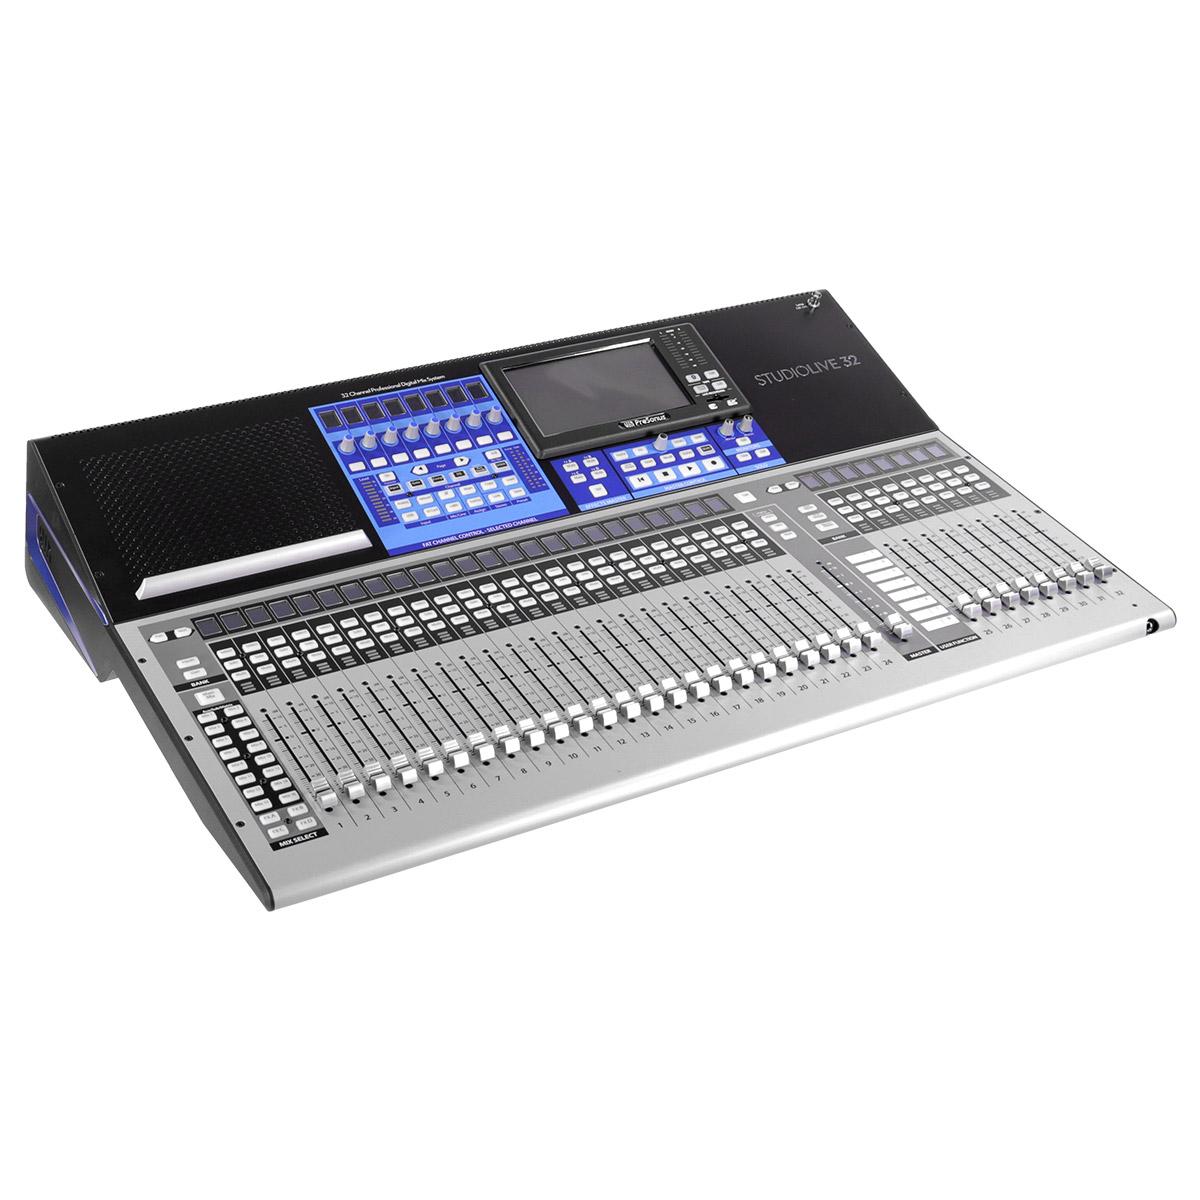 StudioLive 32 Series III